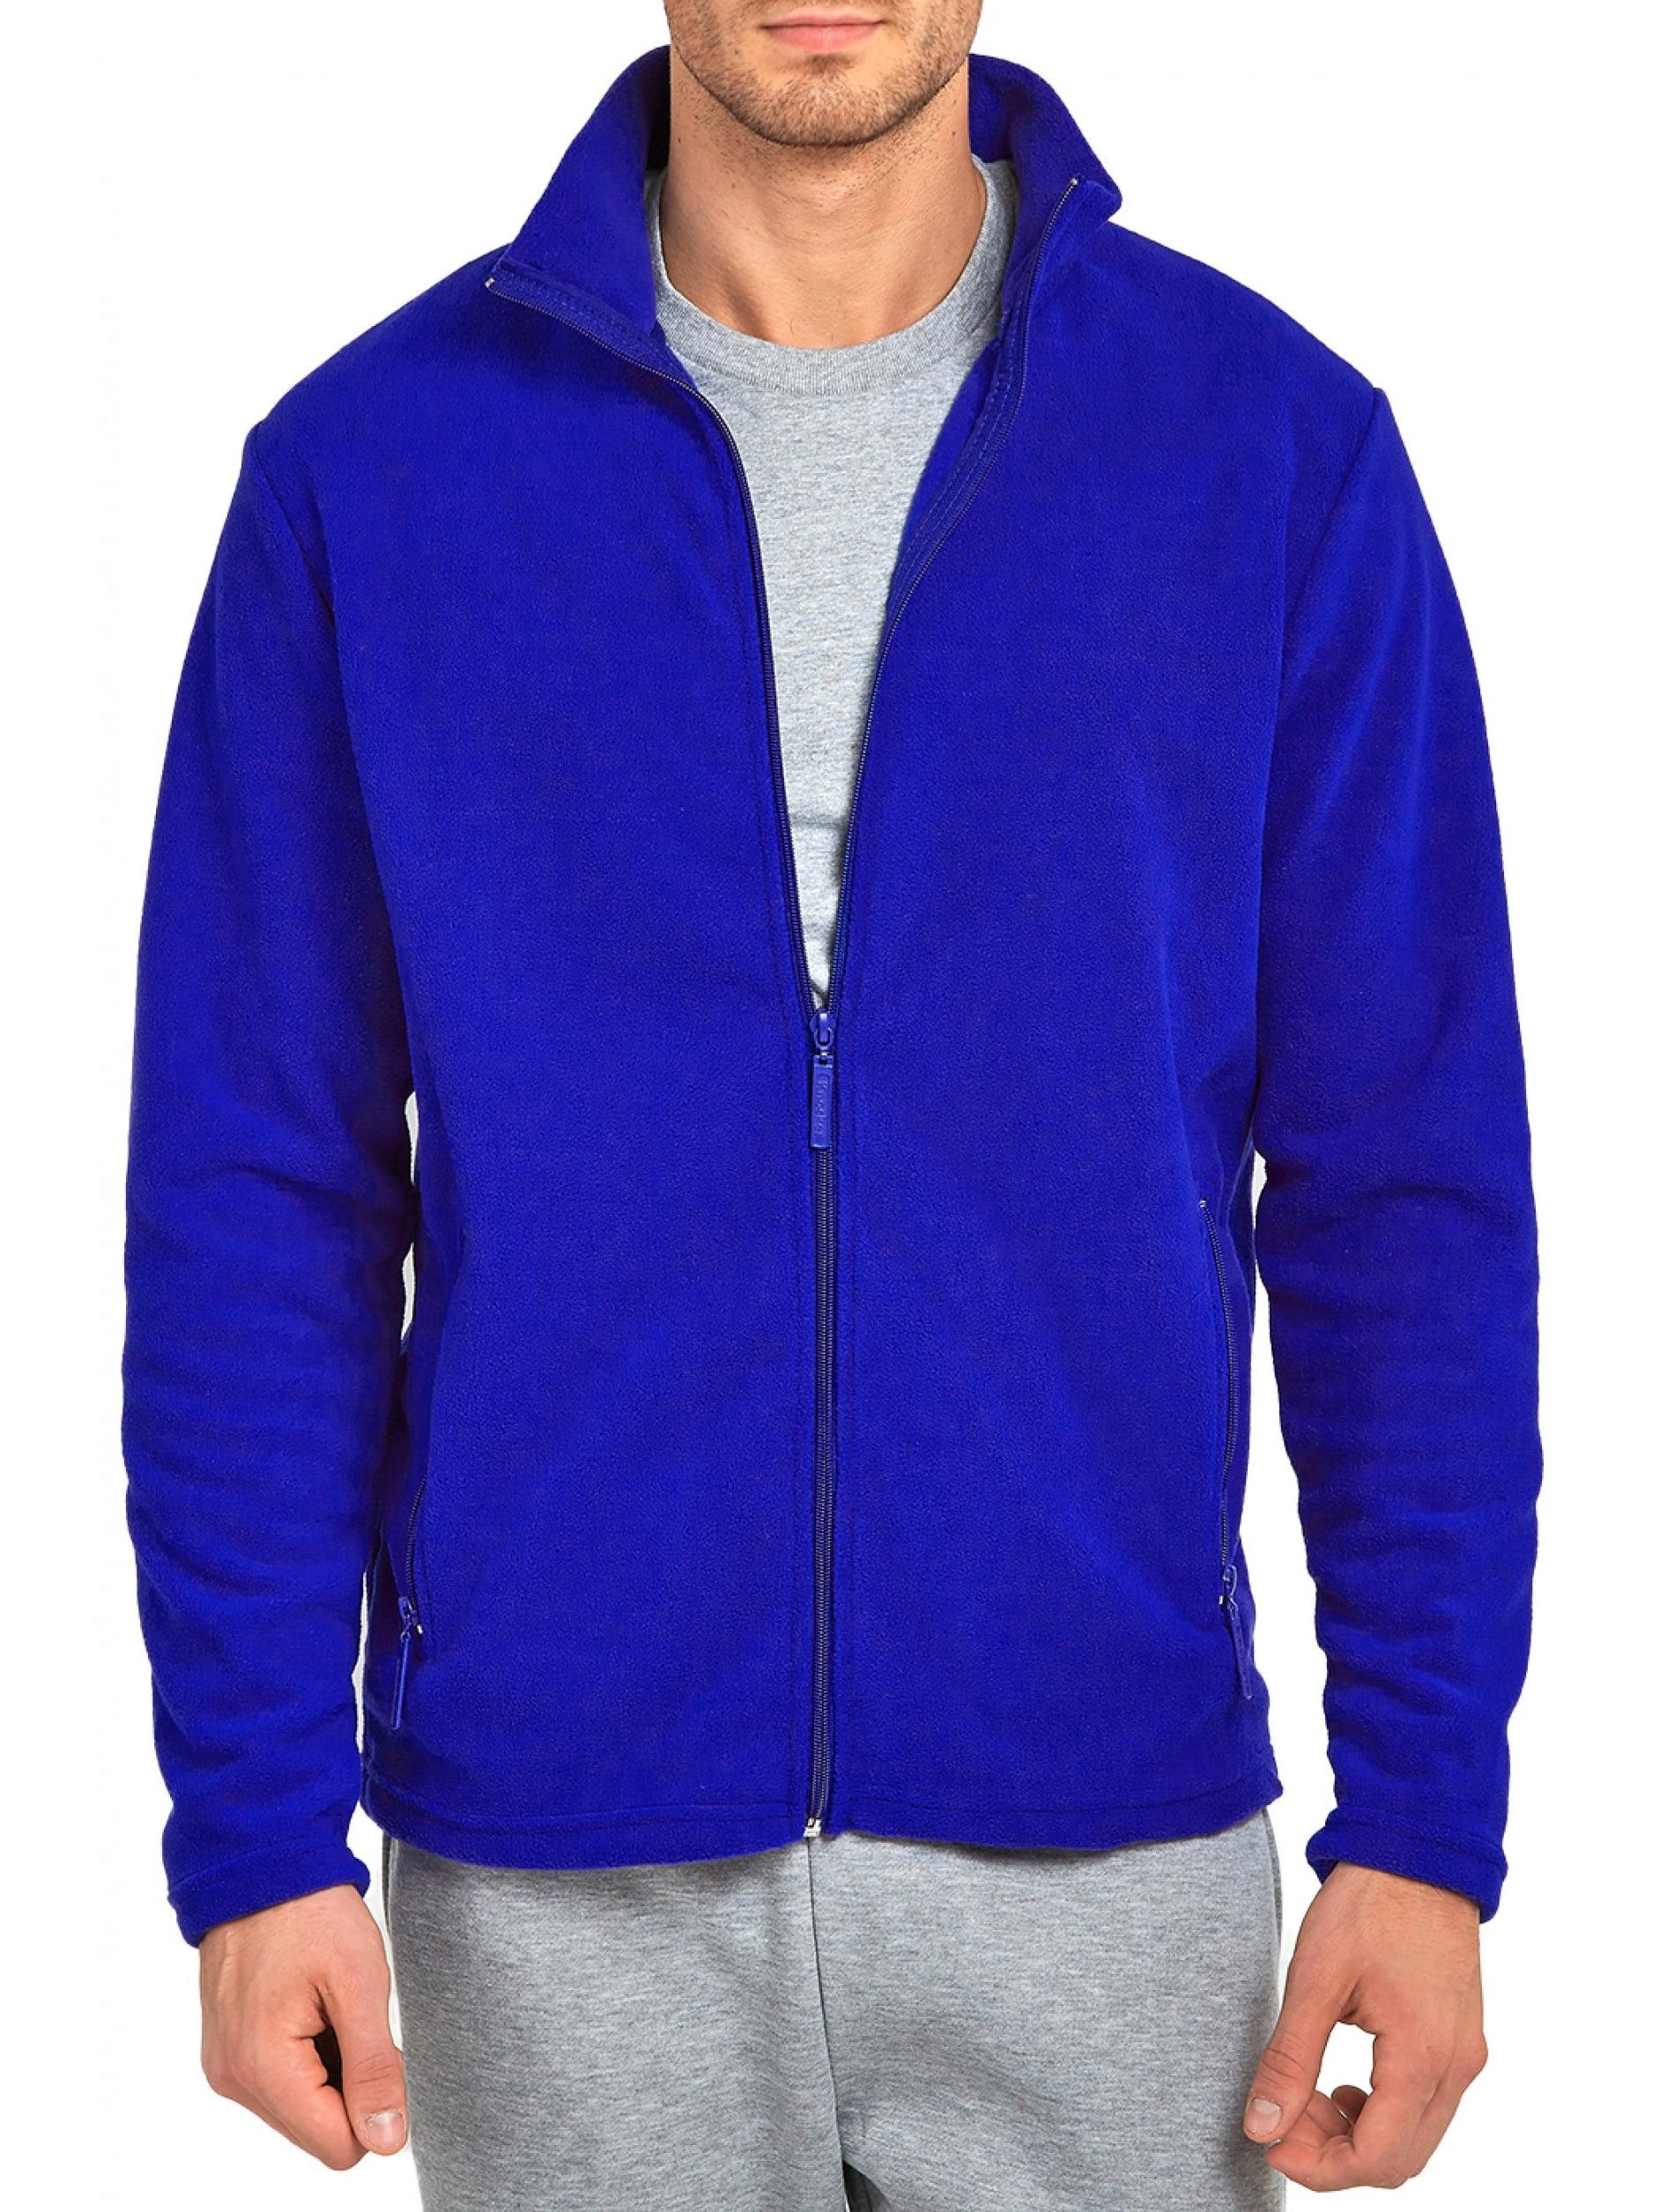 Mechaly Men Classic Full Zip Long Sleeve Polyester Polar Fleece Jacket